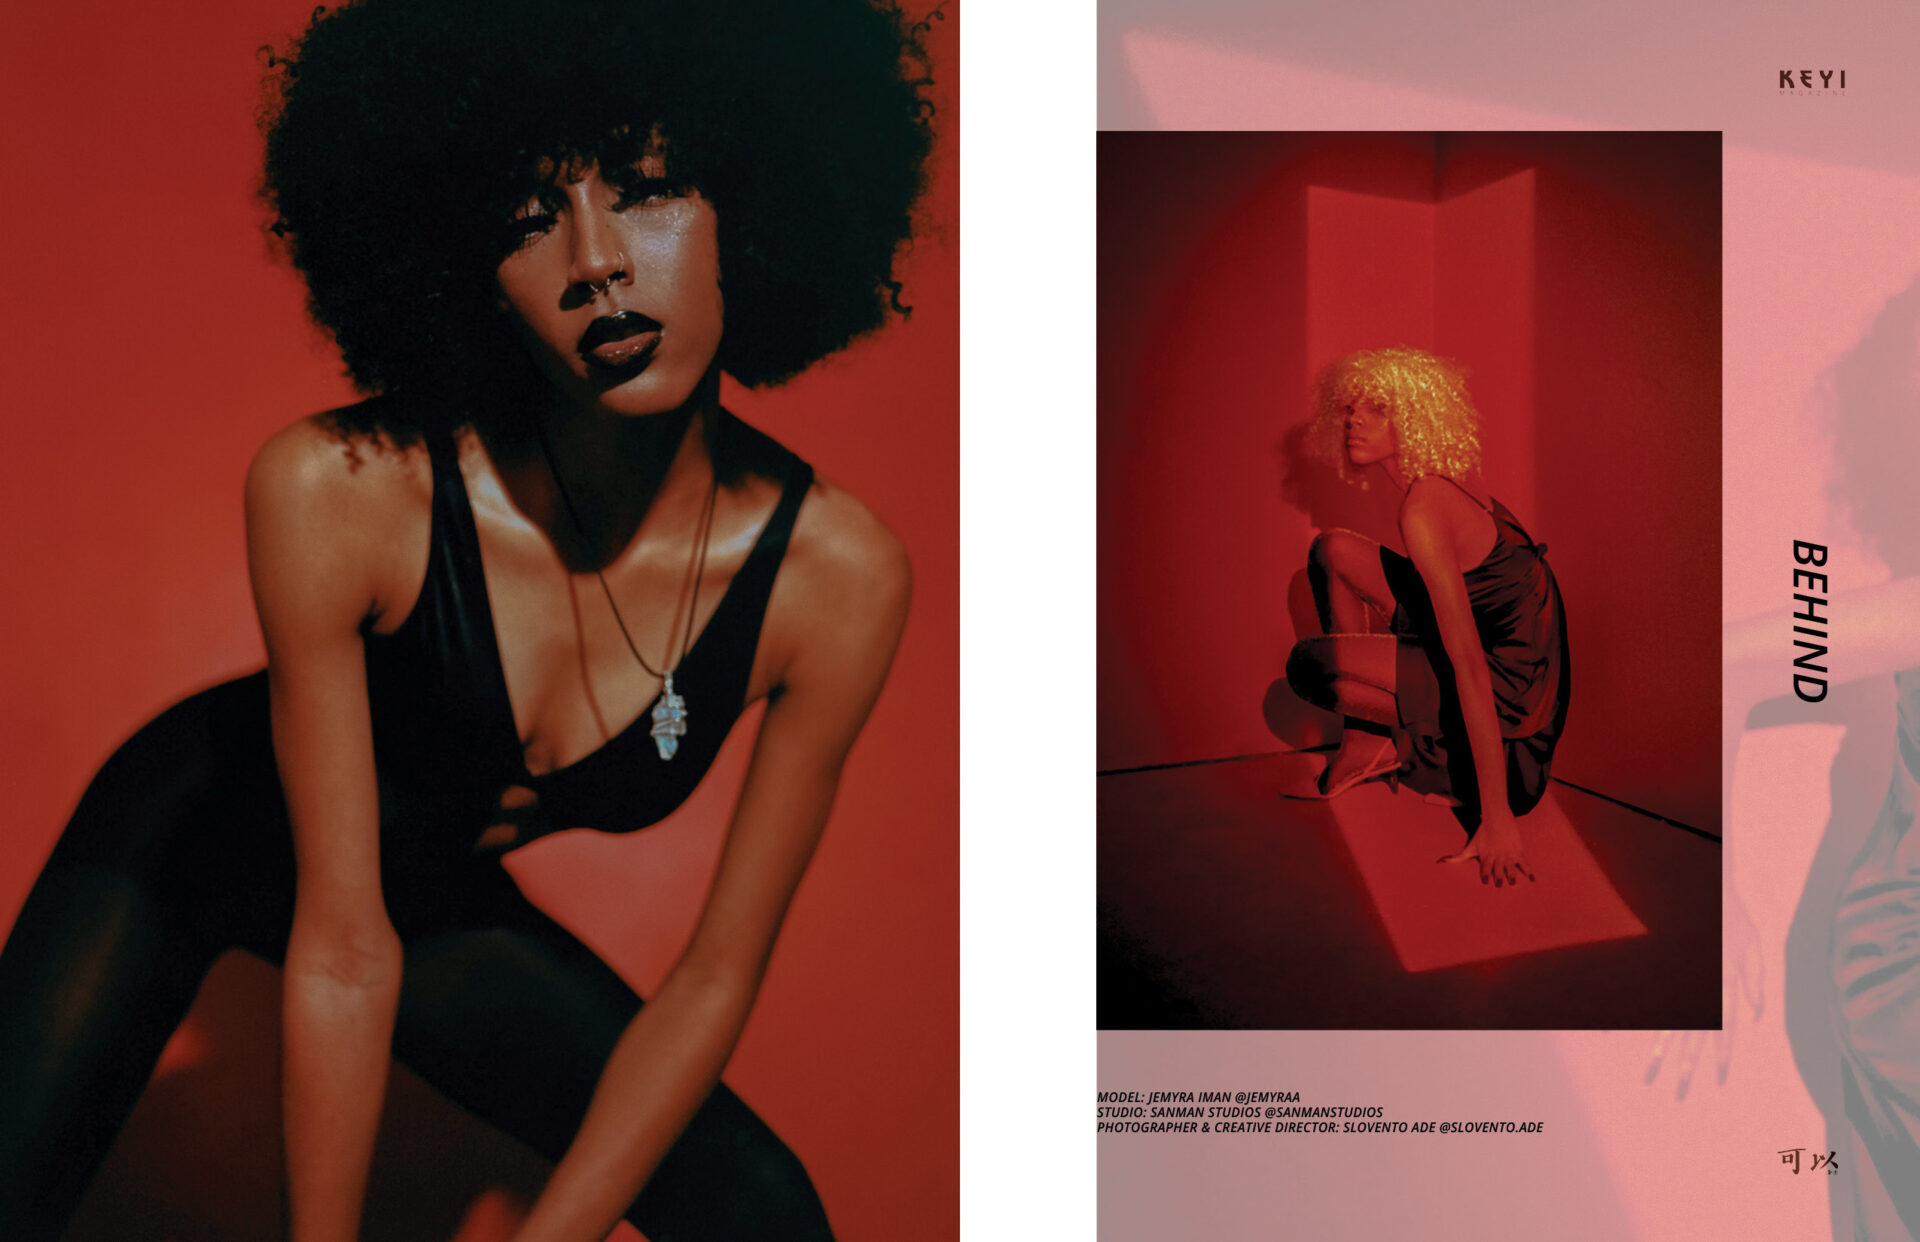 "editorial ""Behind"" by Slavento Ade with Jemyra. Location Sanman studios for keyi magazine  / Berlin / fashion / art / music /"